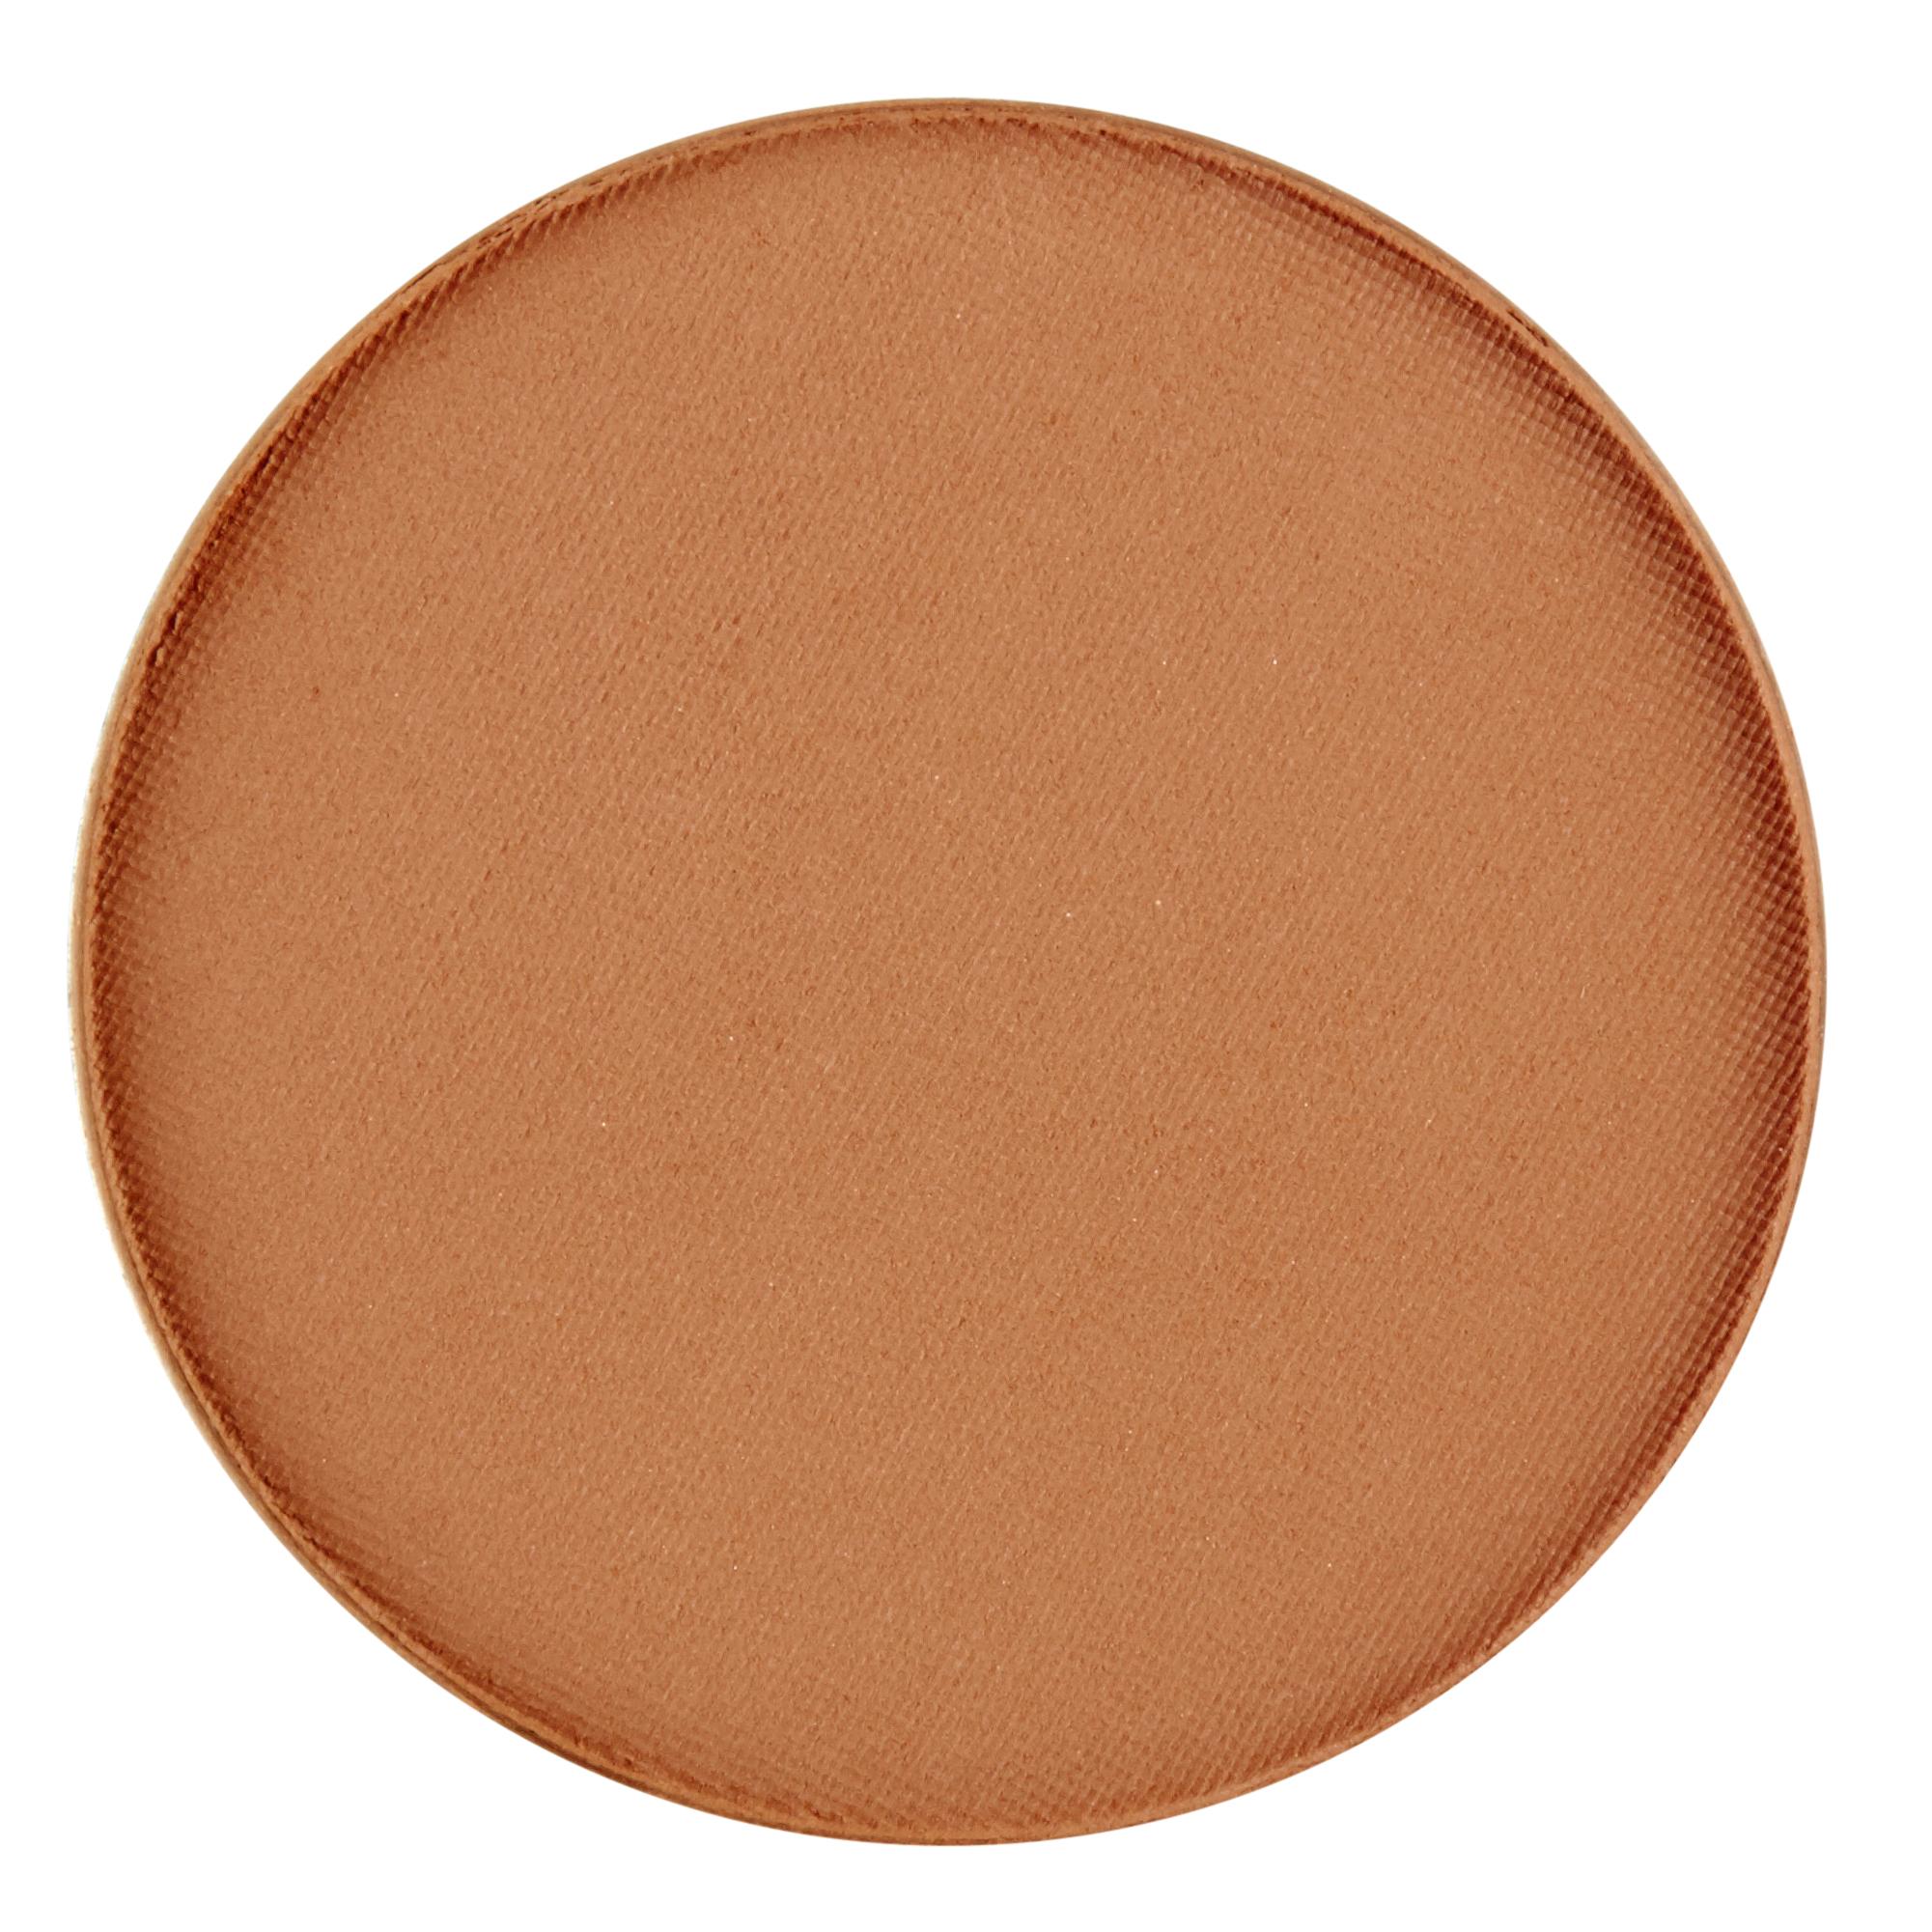 Contour Kit Refill Powder Sandstone